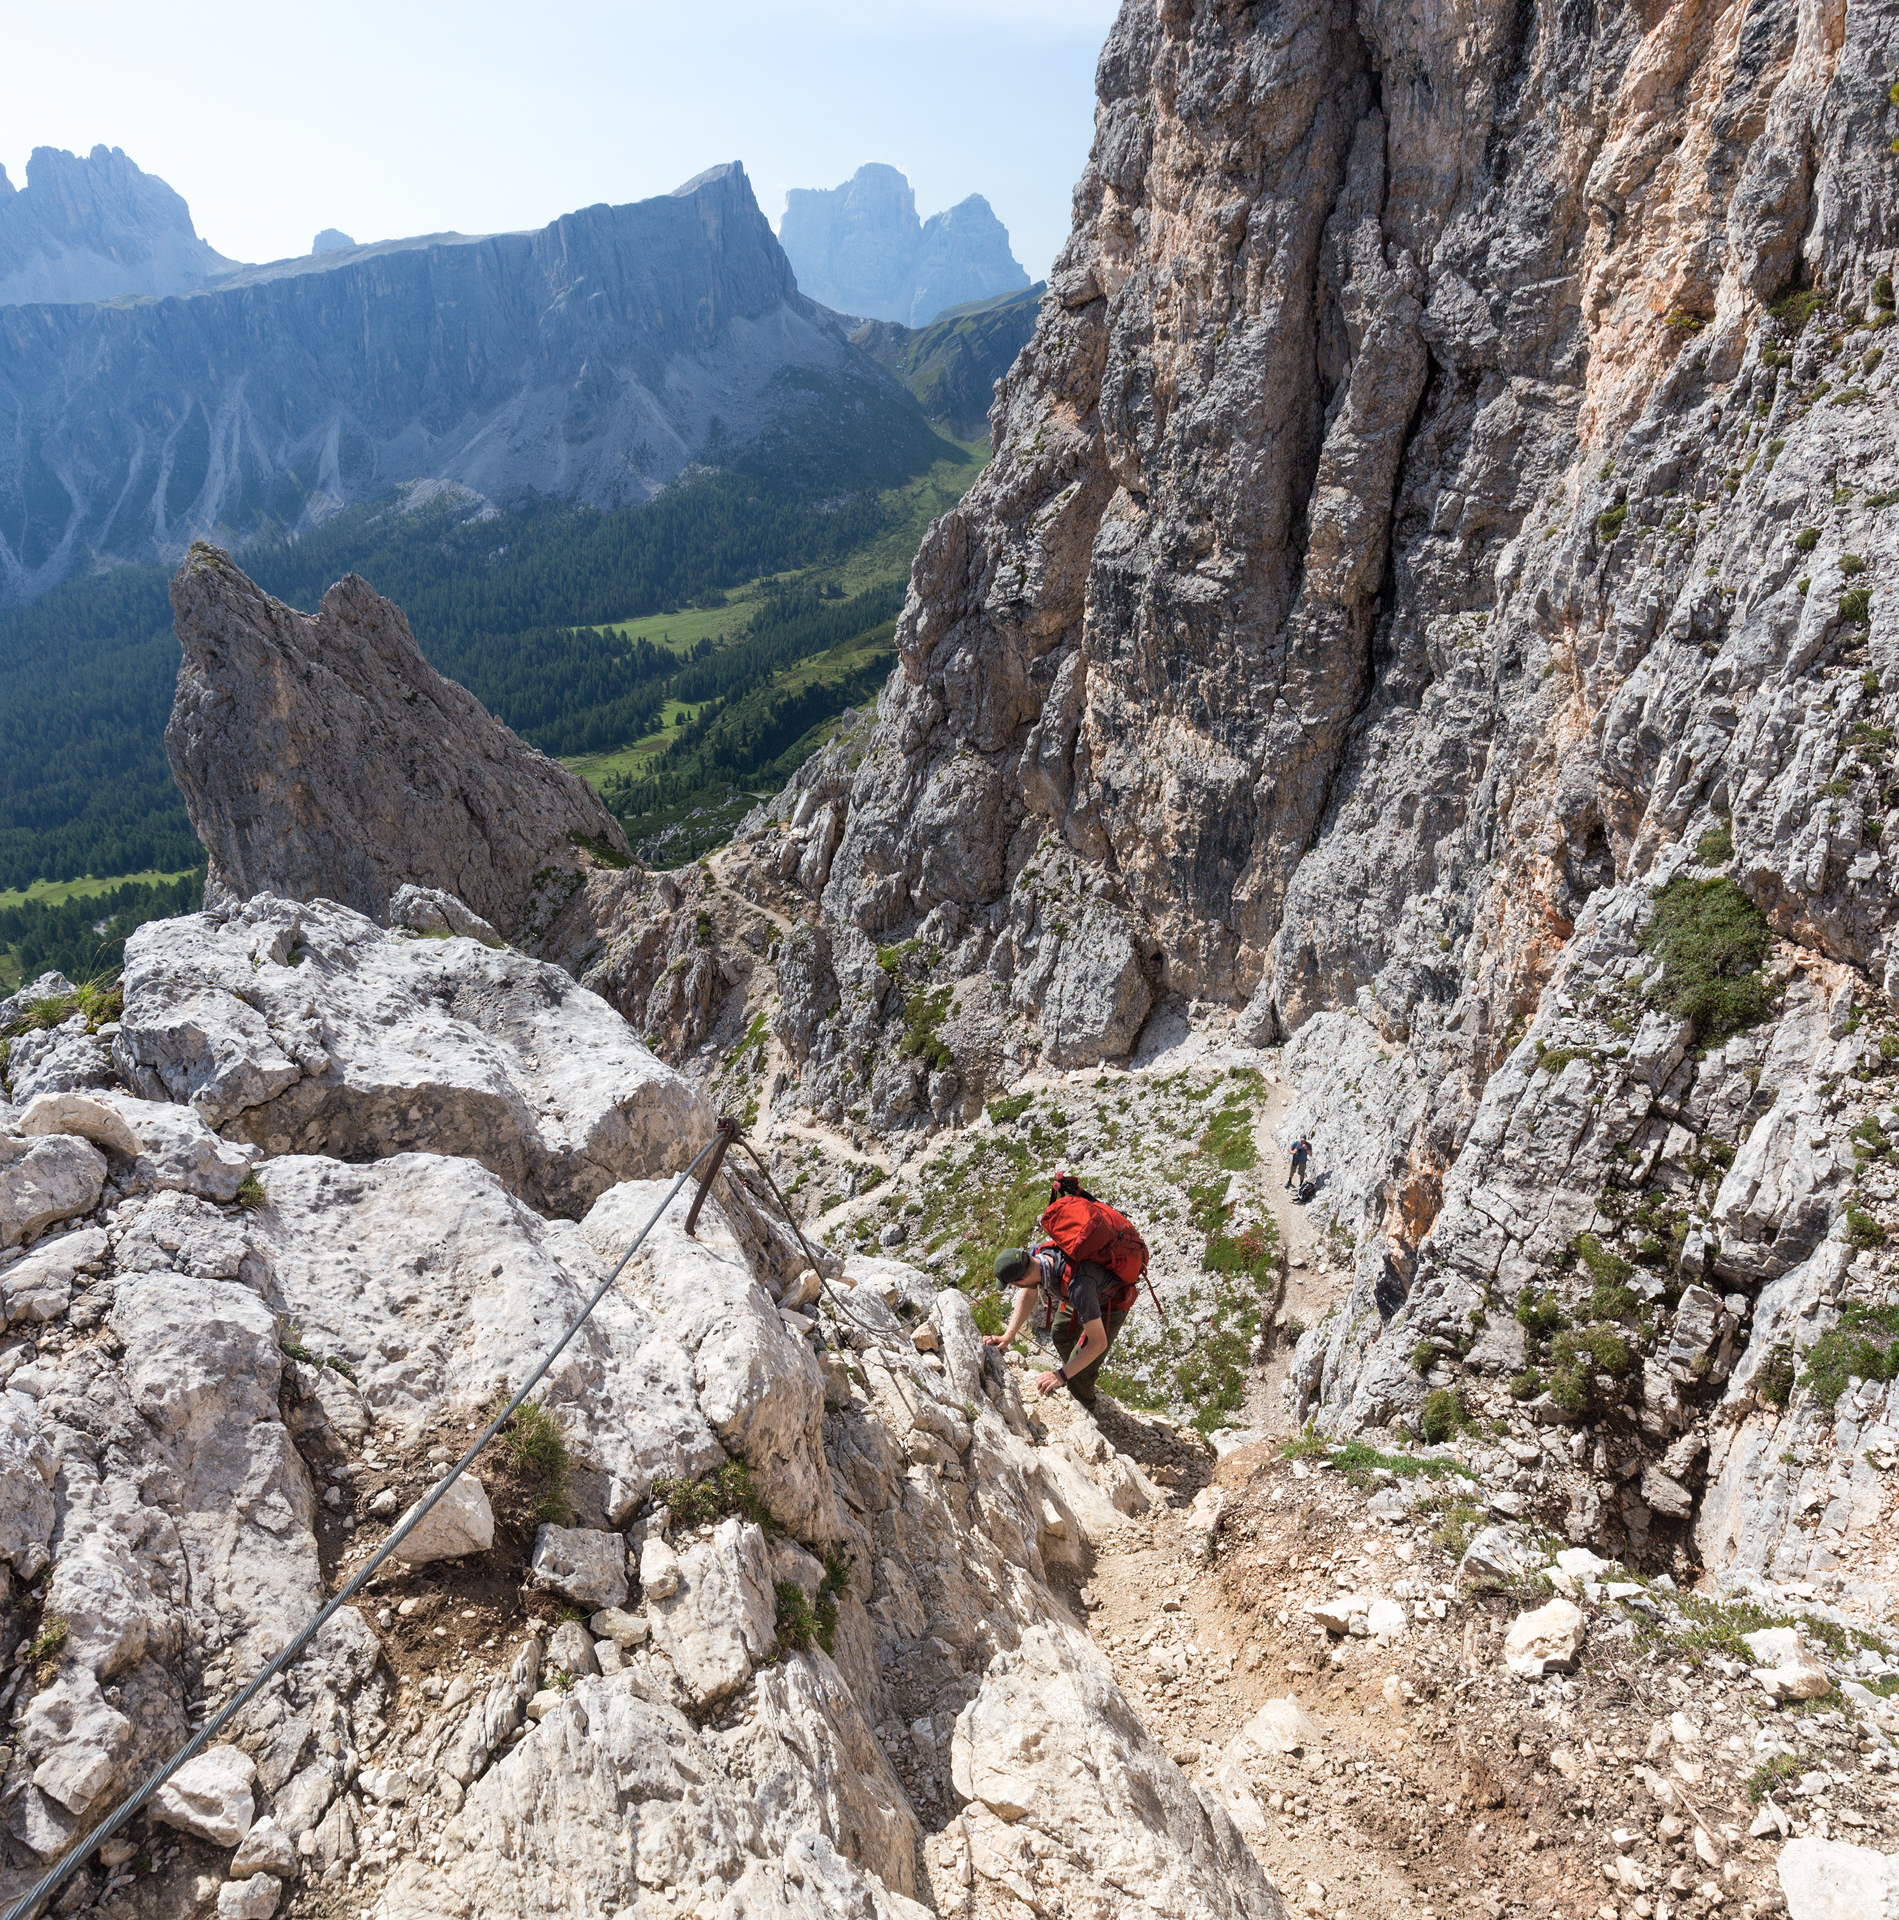 Our friend Evan makes his way down the via ferrata route